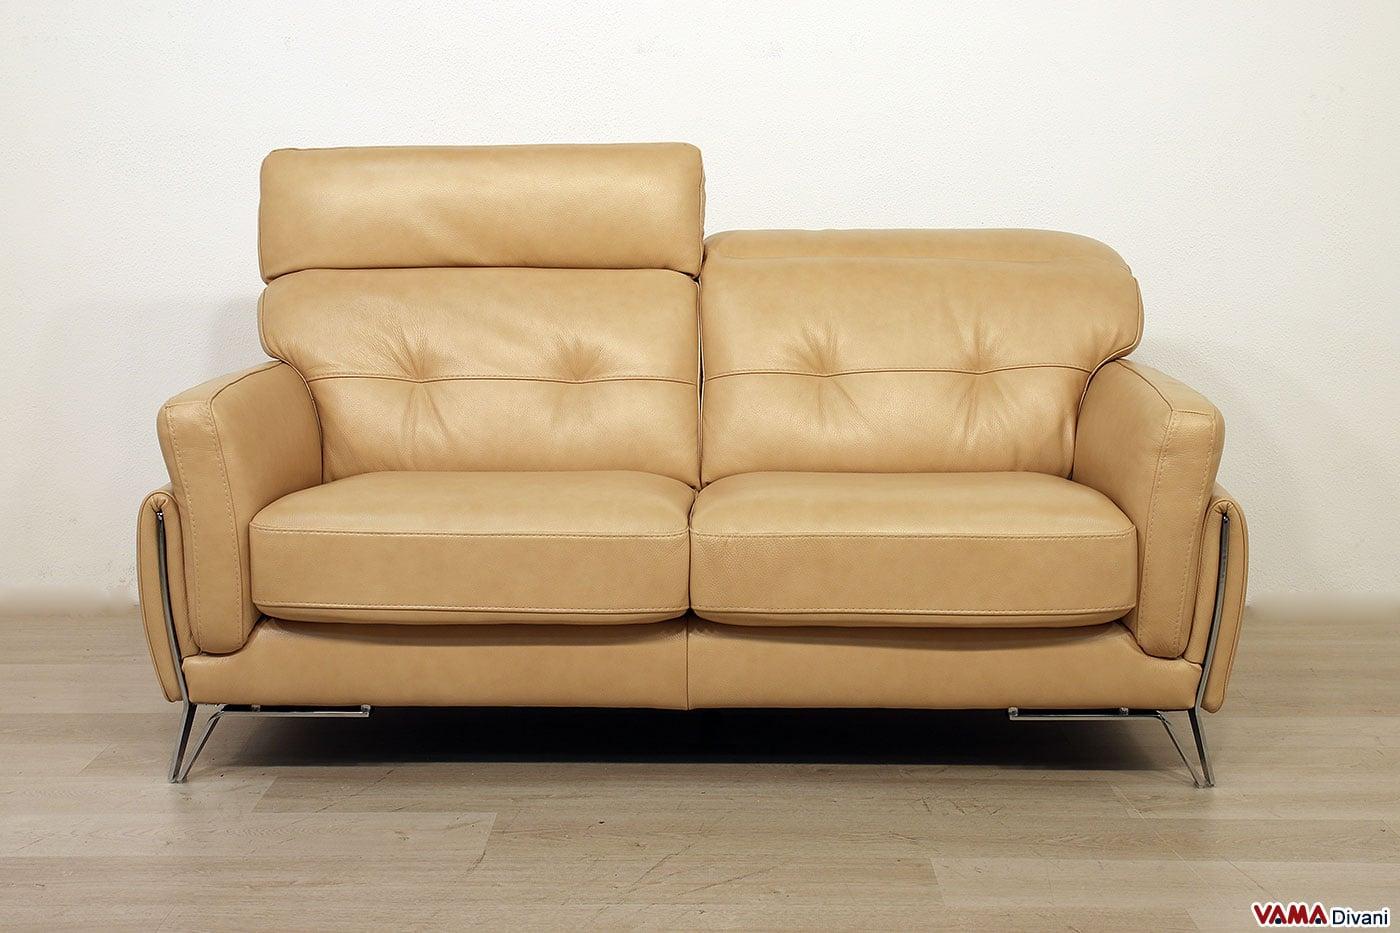 Offerta divano 2 posti ster vama divani for Offerta divano